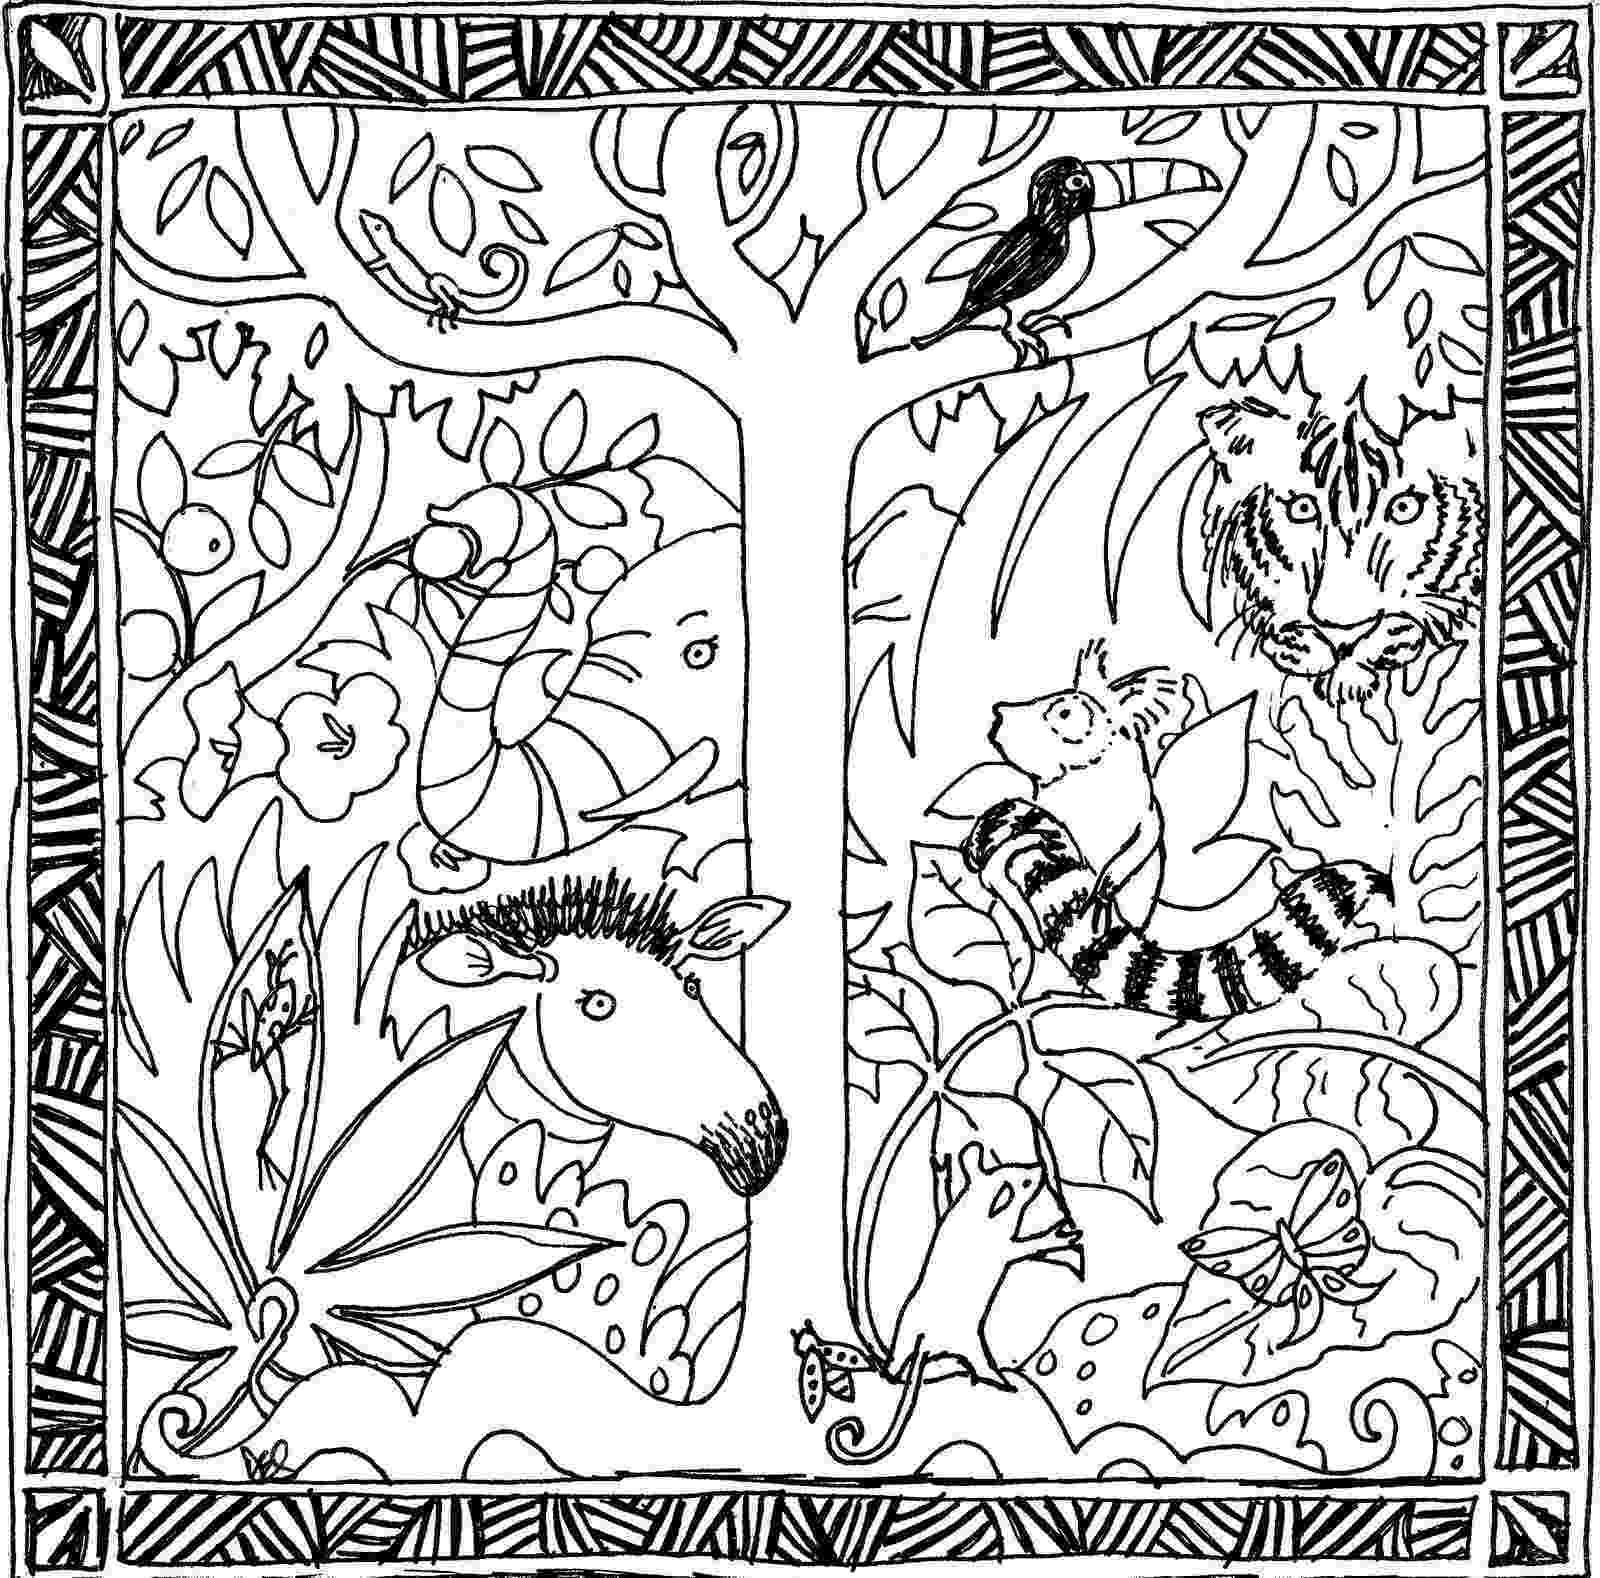 rainforest coloring pages rainforest coloring pages coloring pages to print coloring pages rainforest